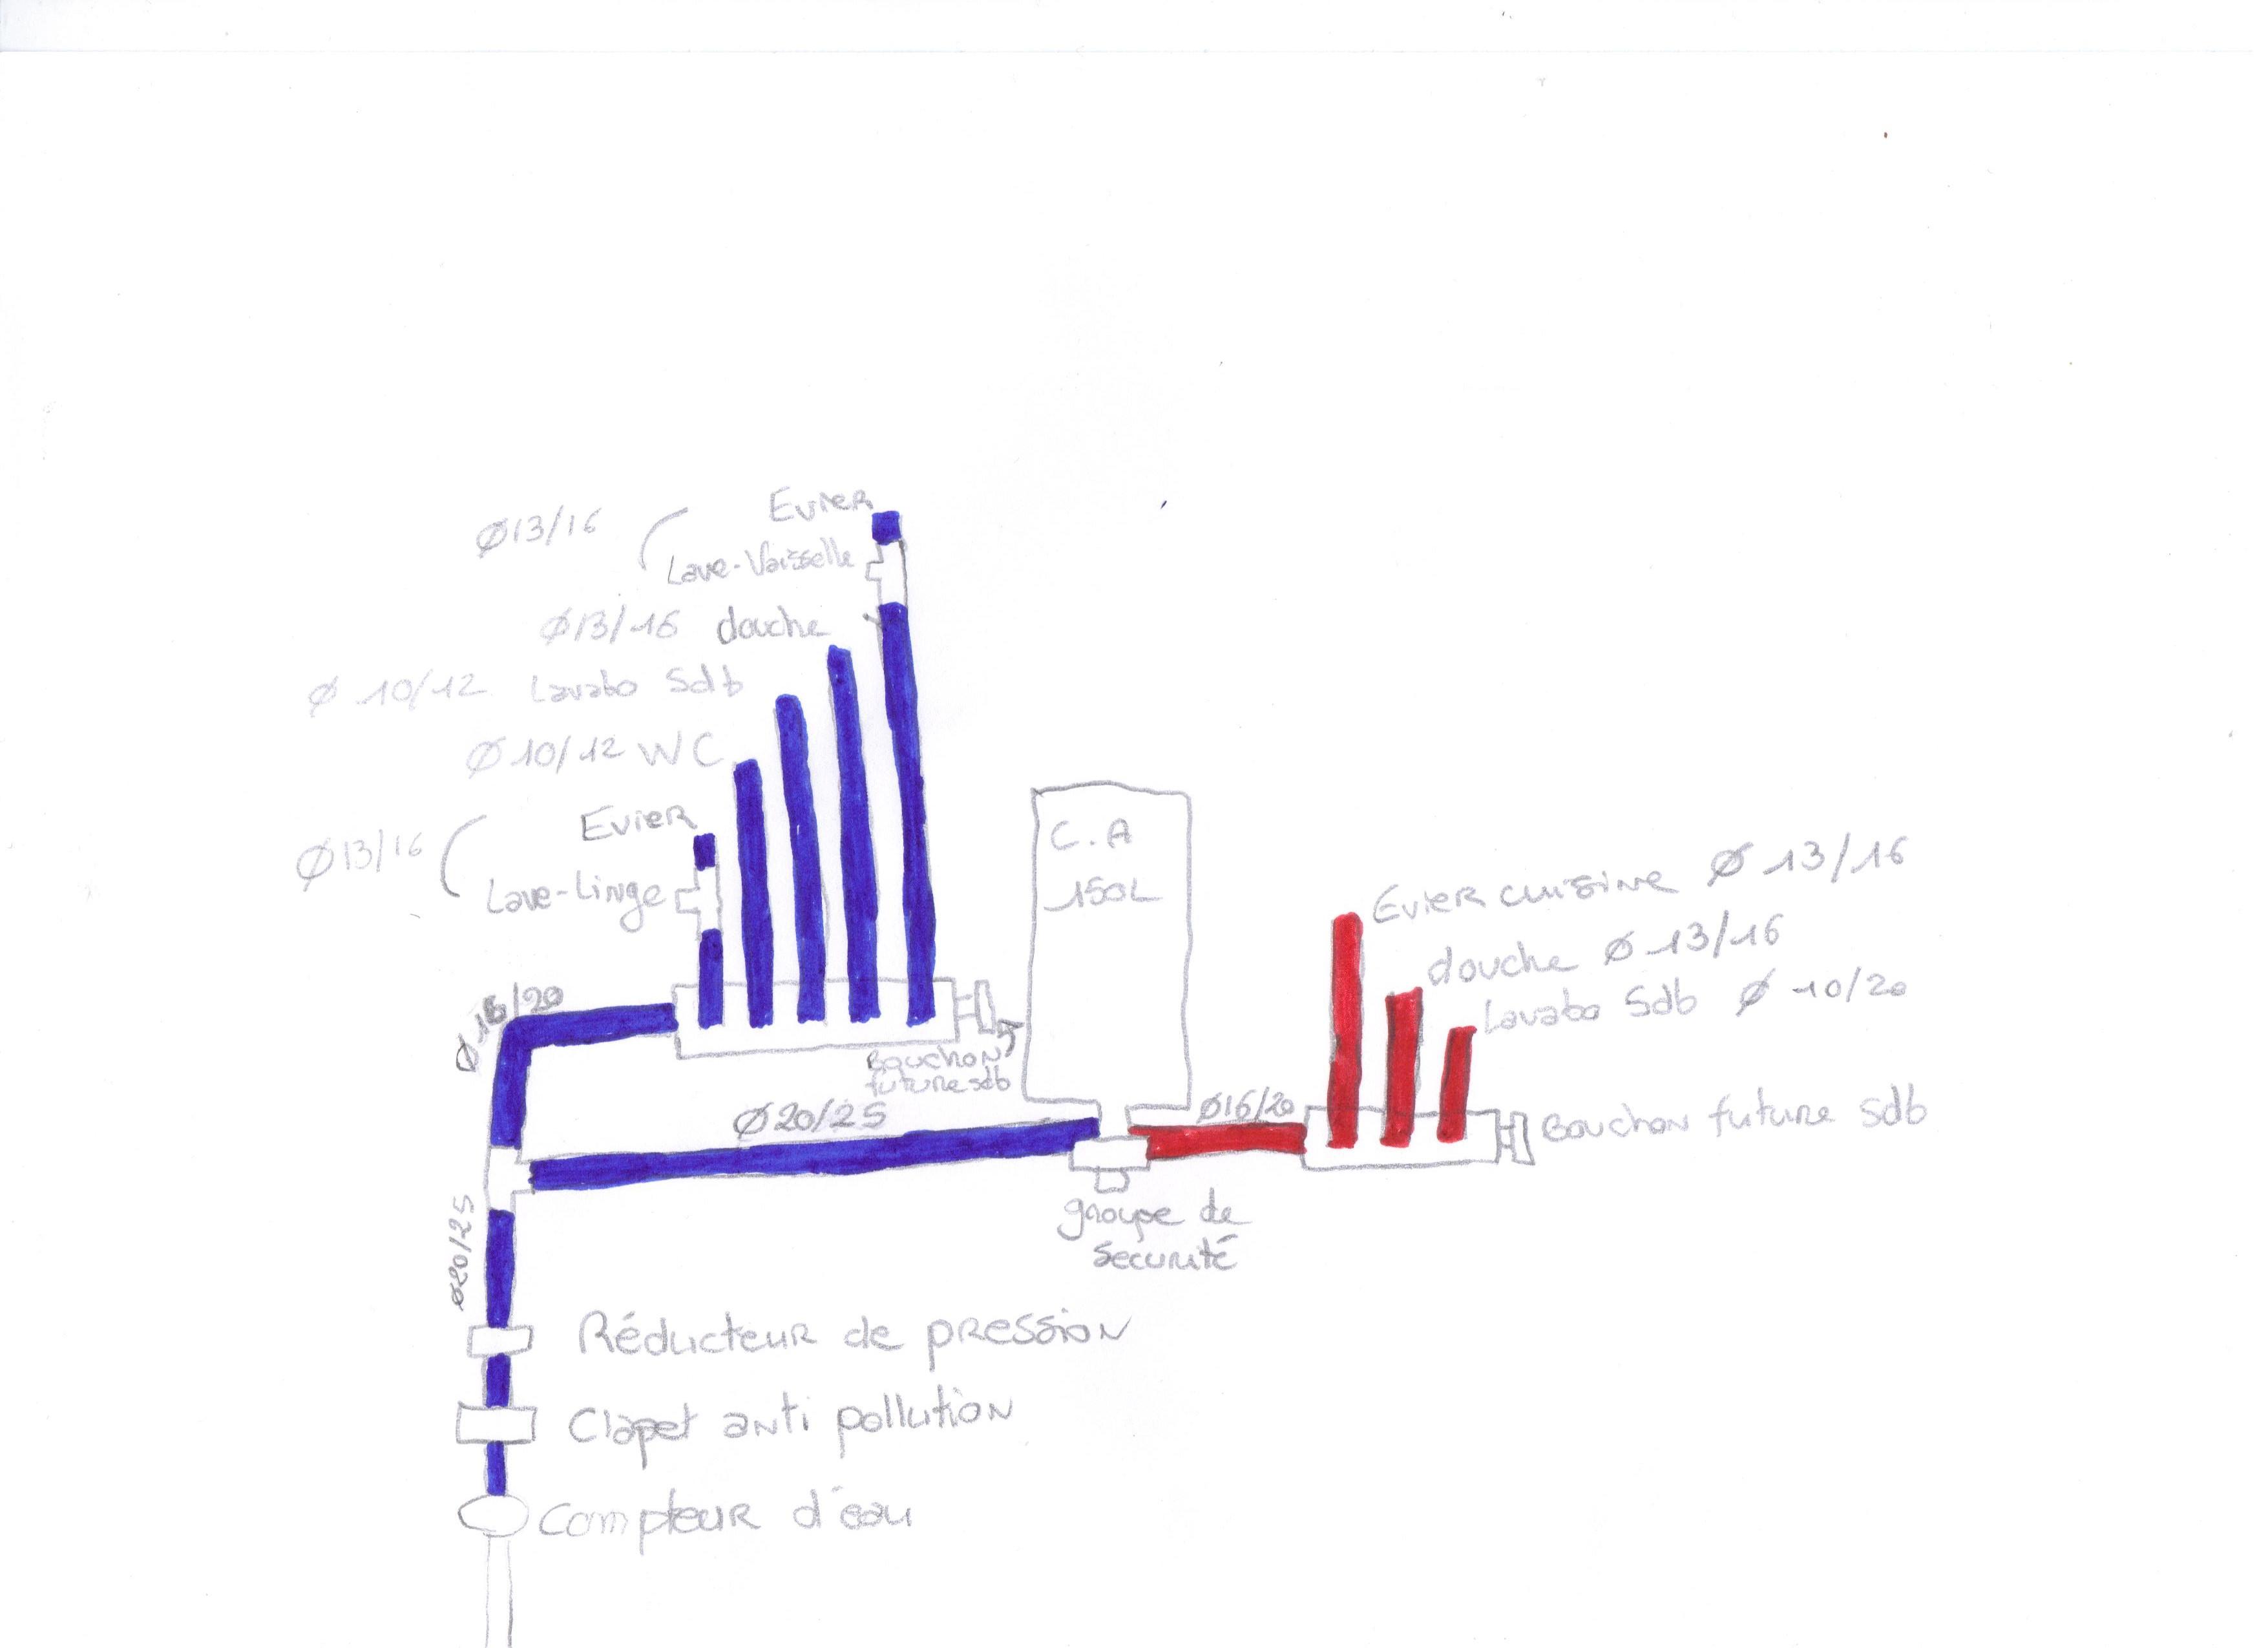 plan per 001.jpg, 417.5 kb, 3510 x 2550